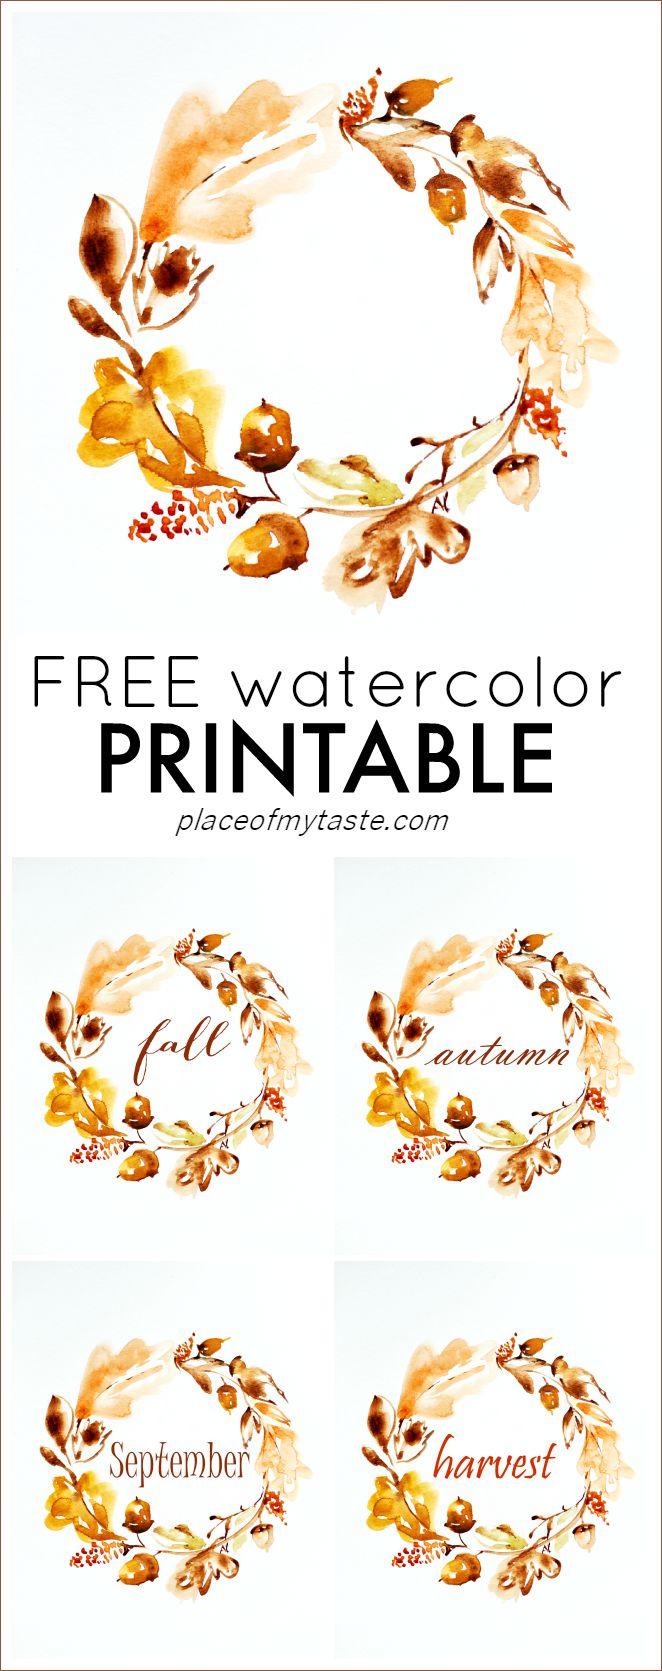 662x1671 Free Watercolor Thanksgiving Printable